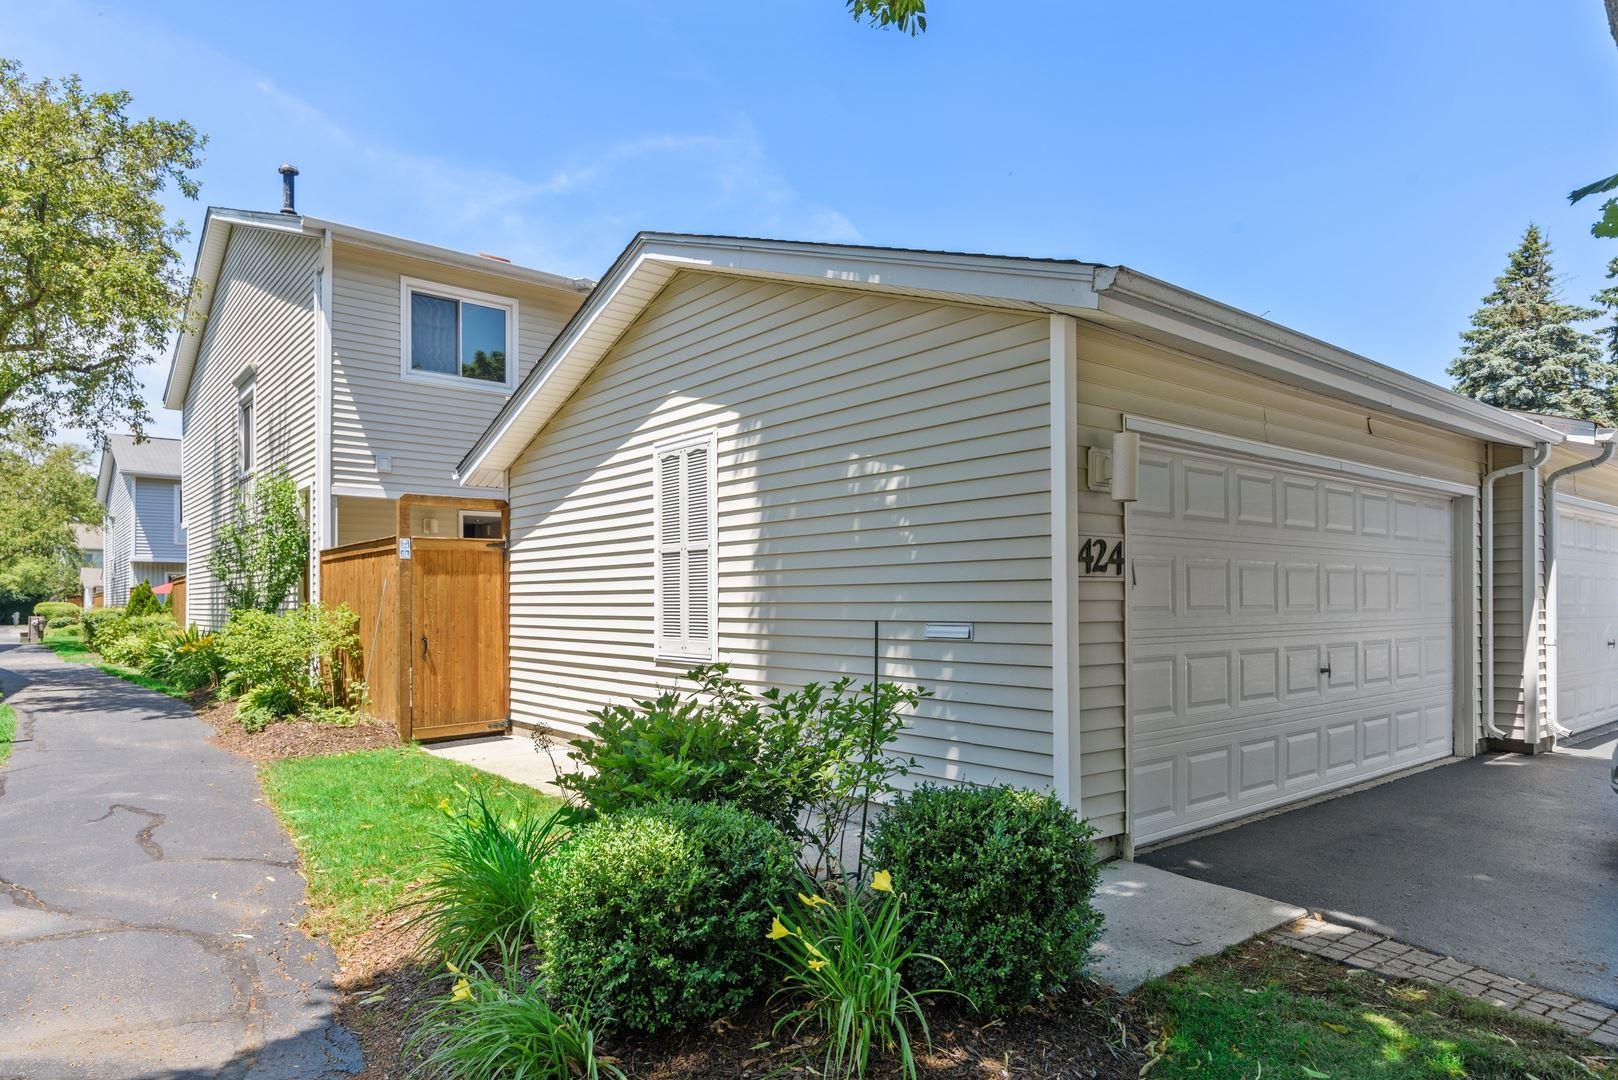 424 HAZELWOOD Terrace, Buffalo Grove, IL 60089 - #: 10733076